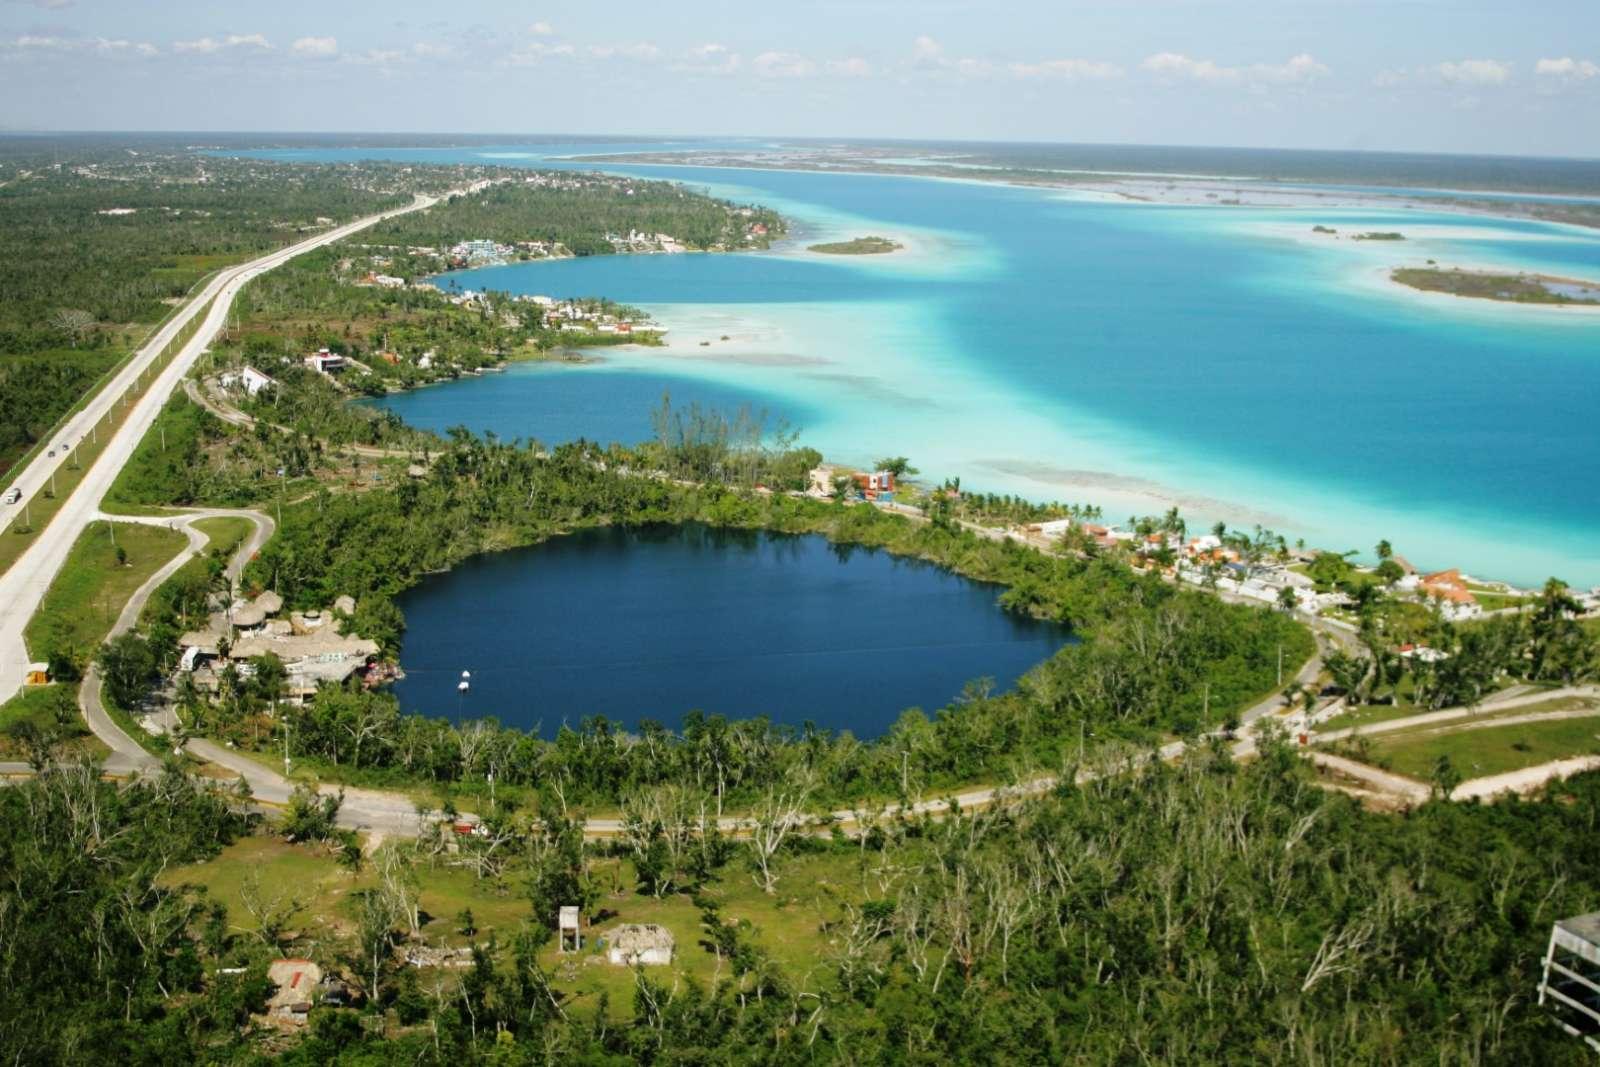 Cenote Azul next to Laguna Bacalar